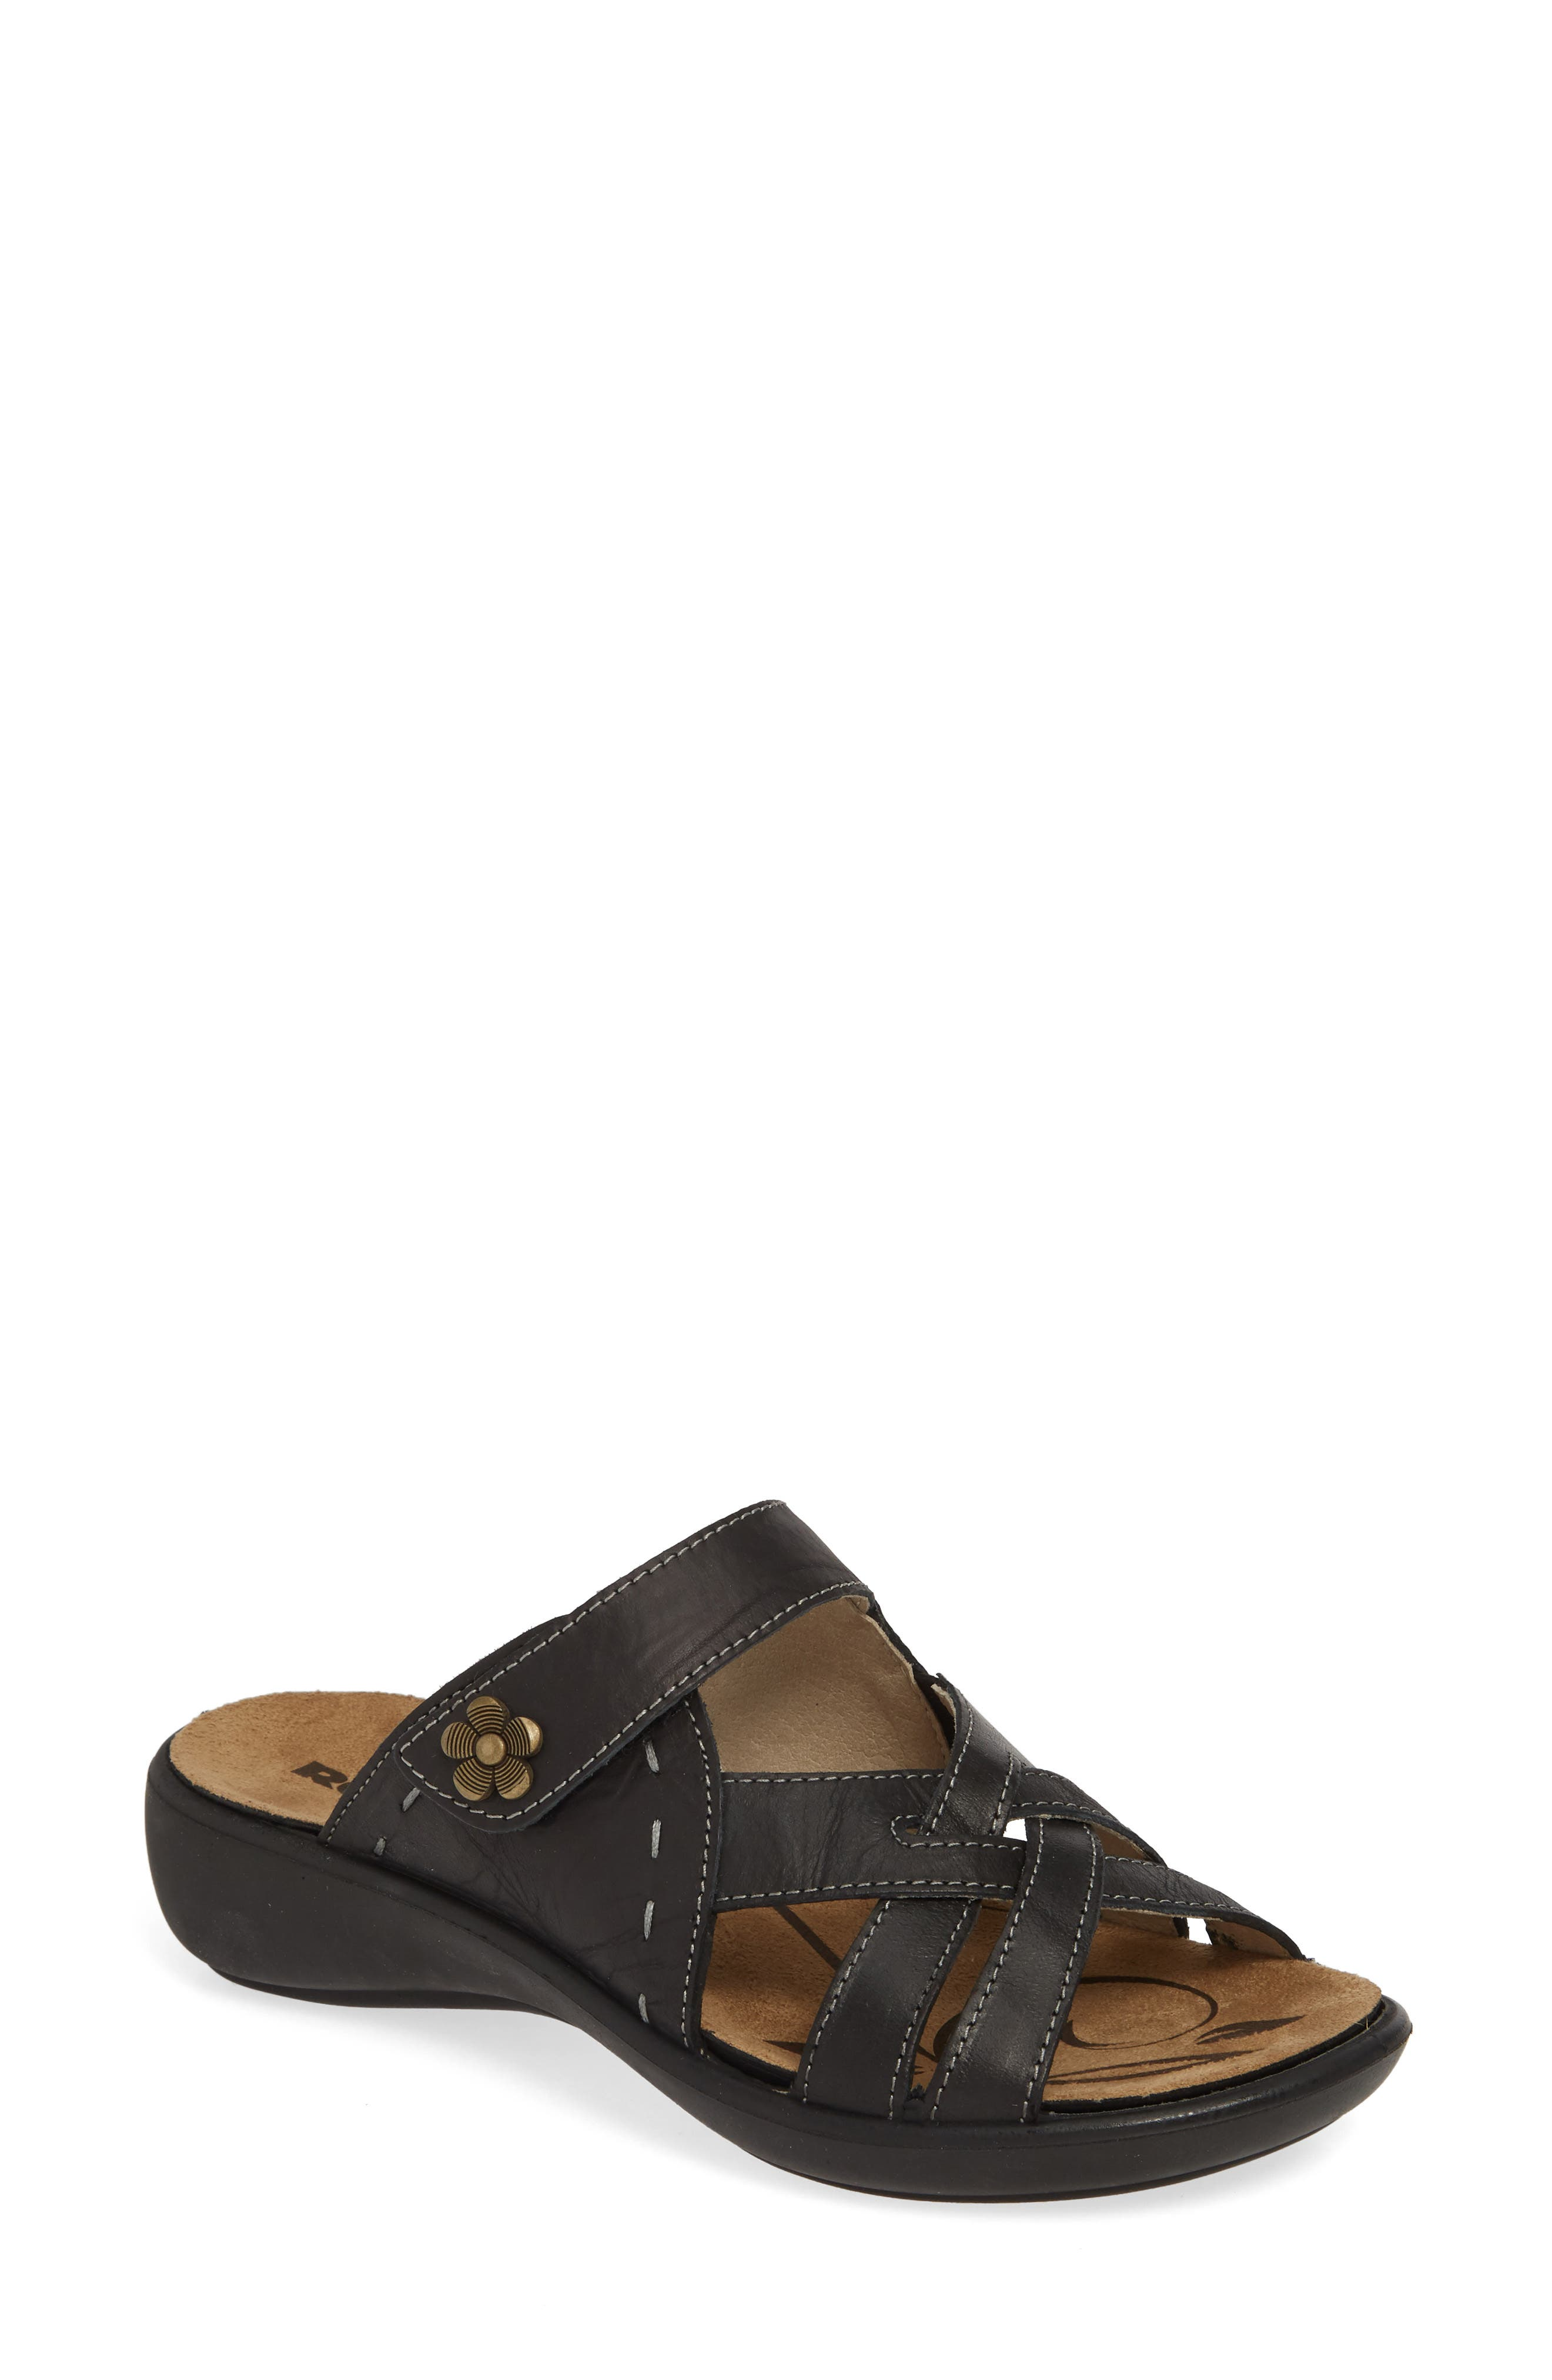 ROMIKA<SUP>®</SUP>, Ibiza 99 Slide Sandal, Main thumbnail 1, color, BLACK LEATHER